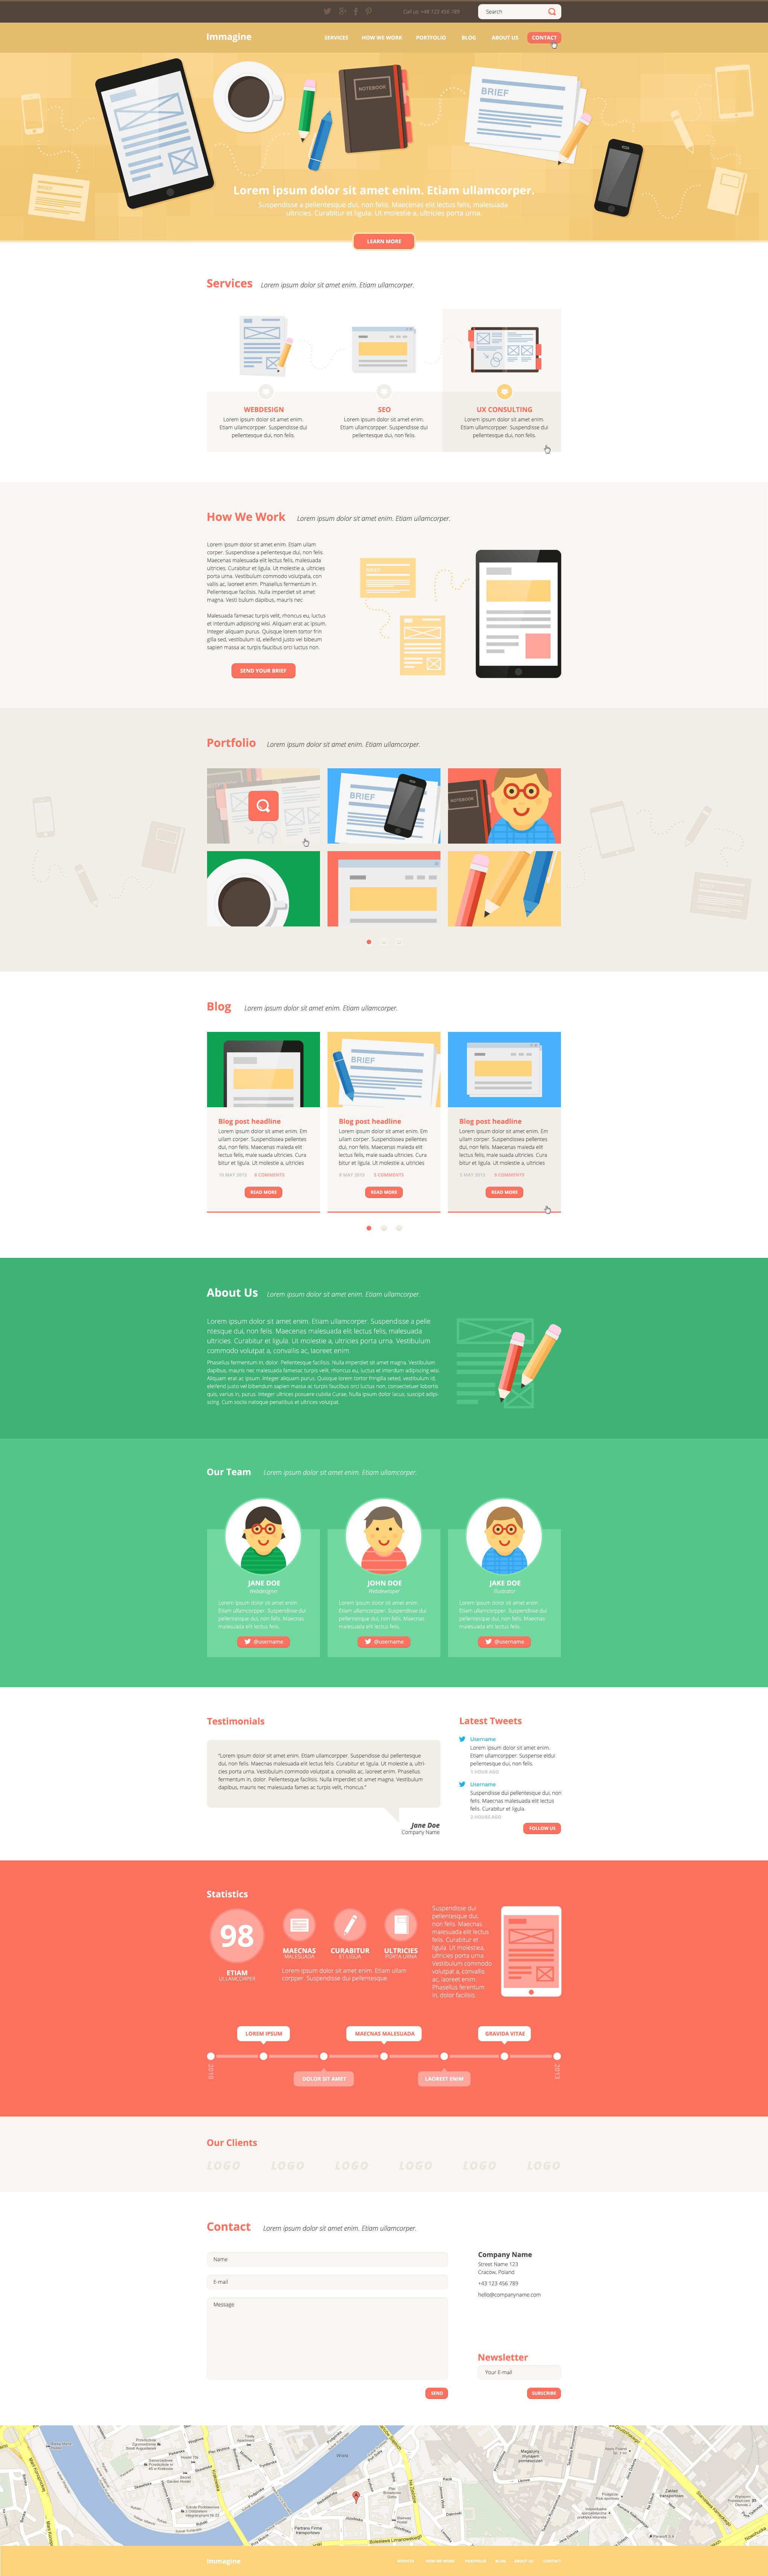 Flat webdesign. | Webdesign | Pinterest | Cosas lindas ...